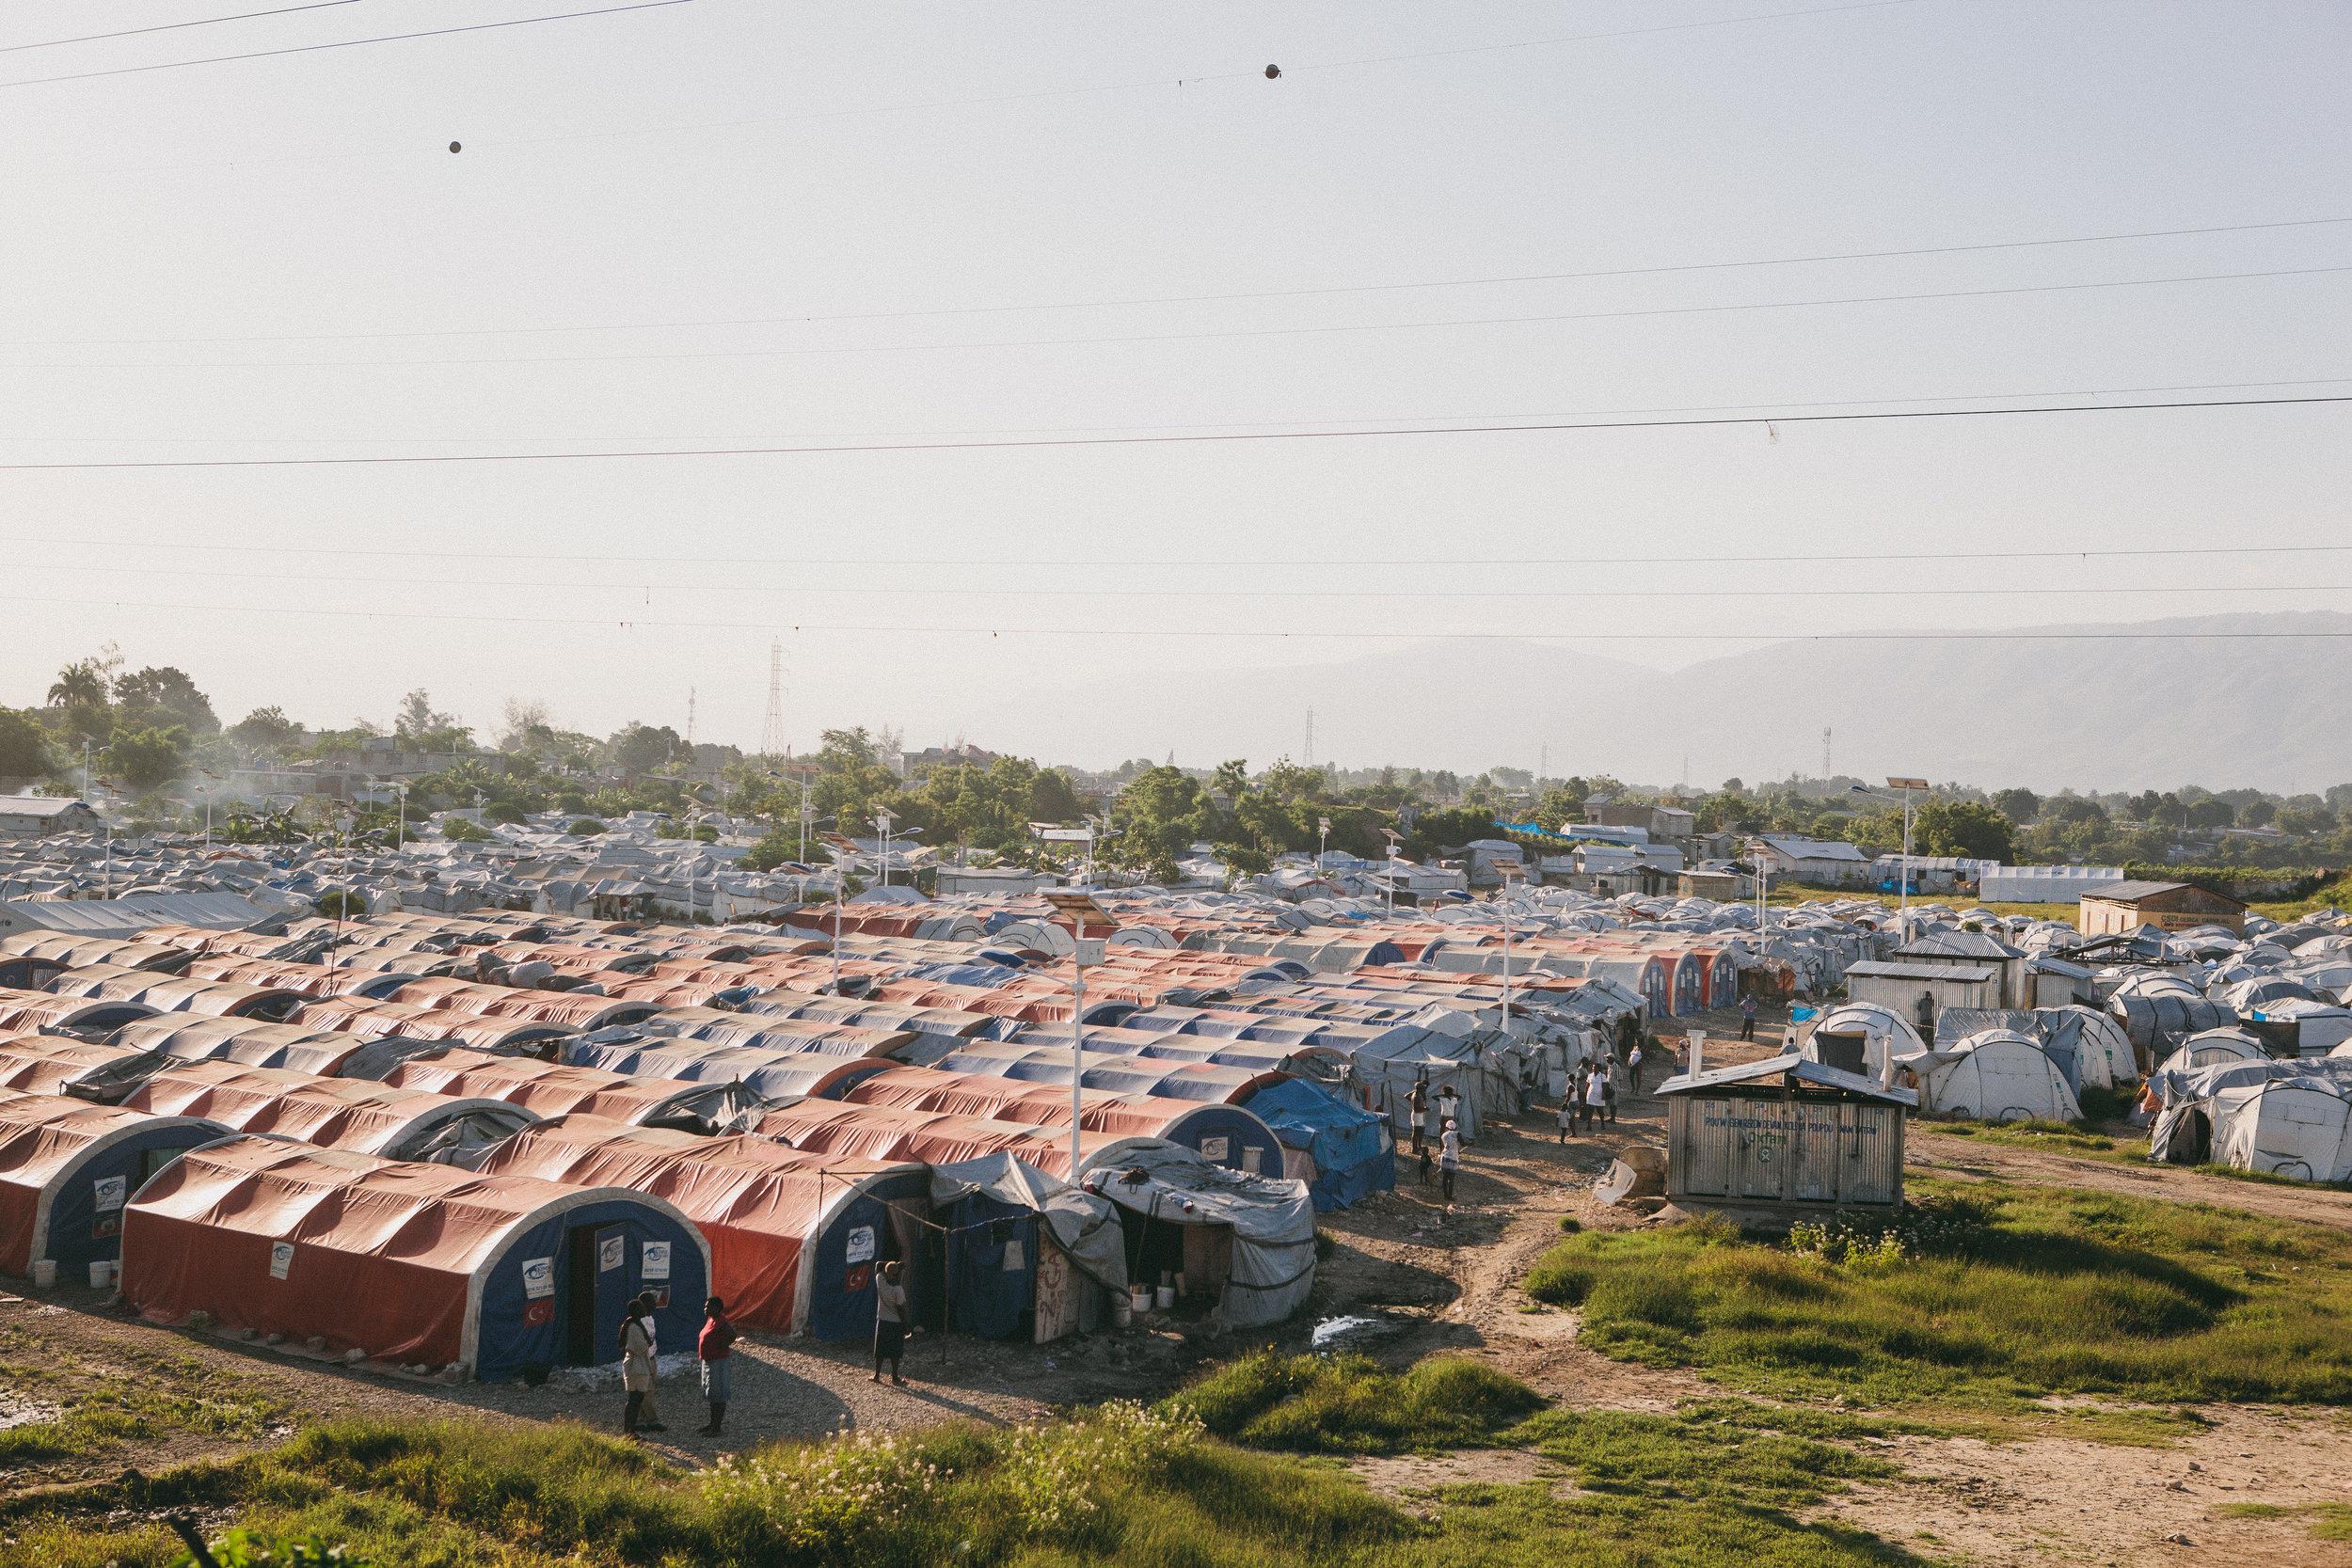 Haiti_Street_Scenes_001.jpg